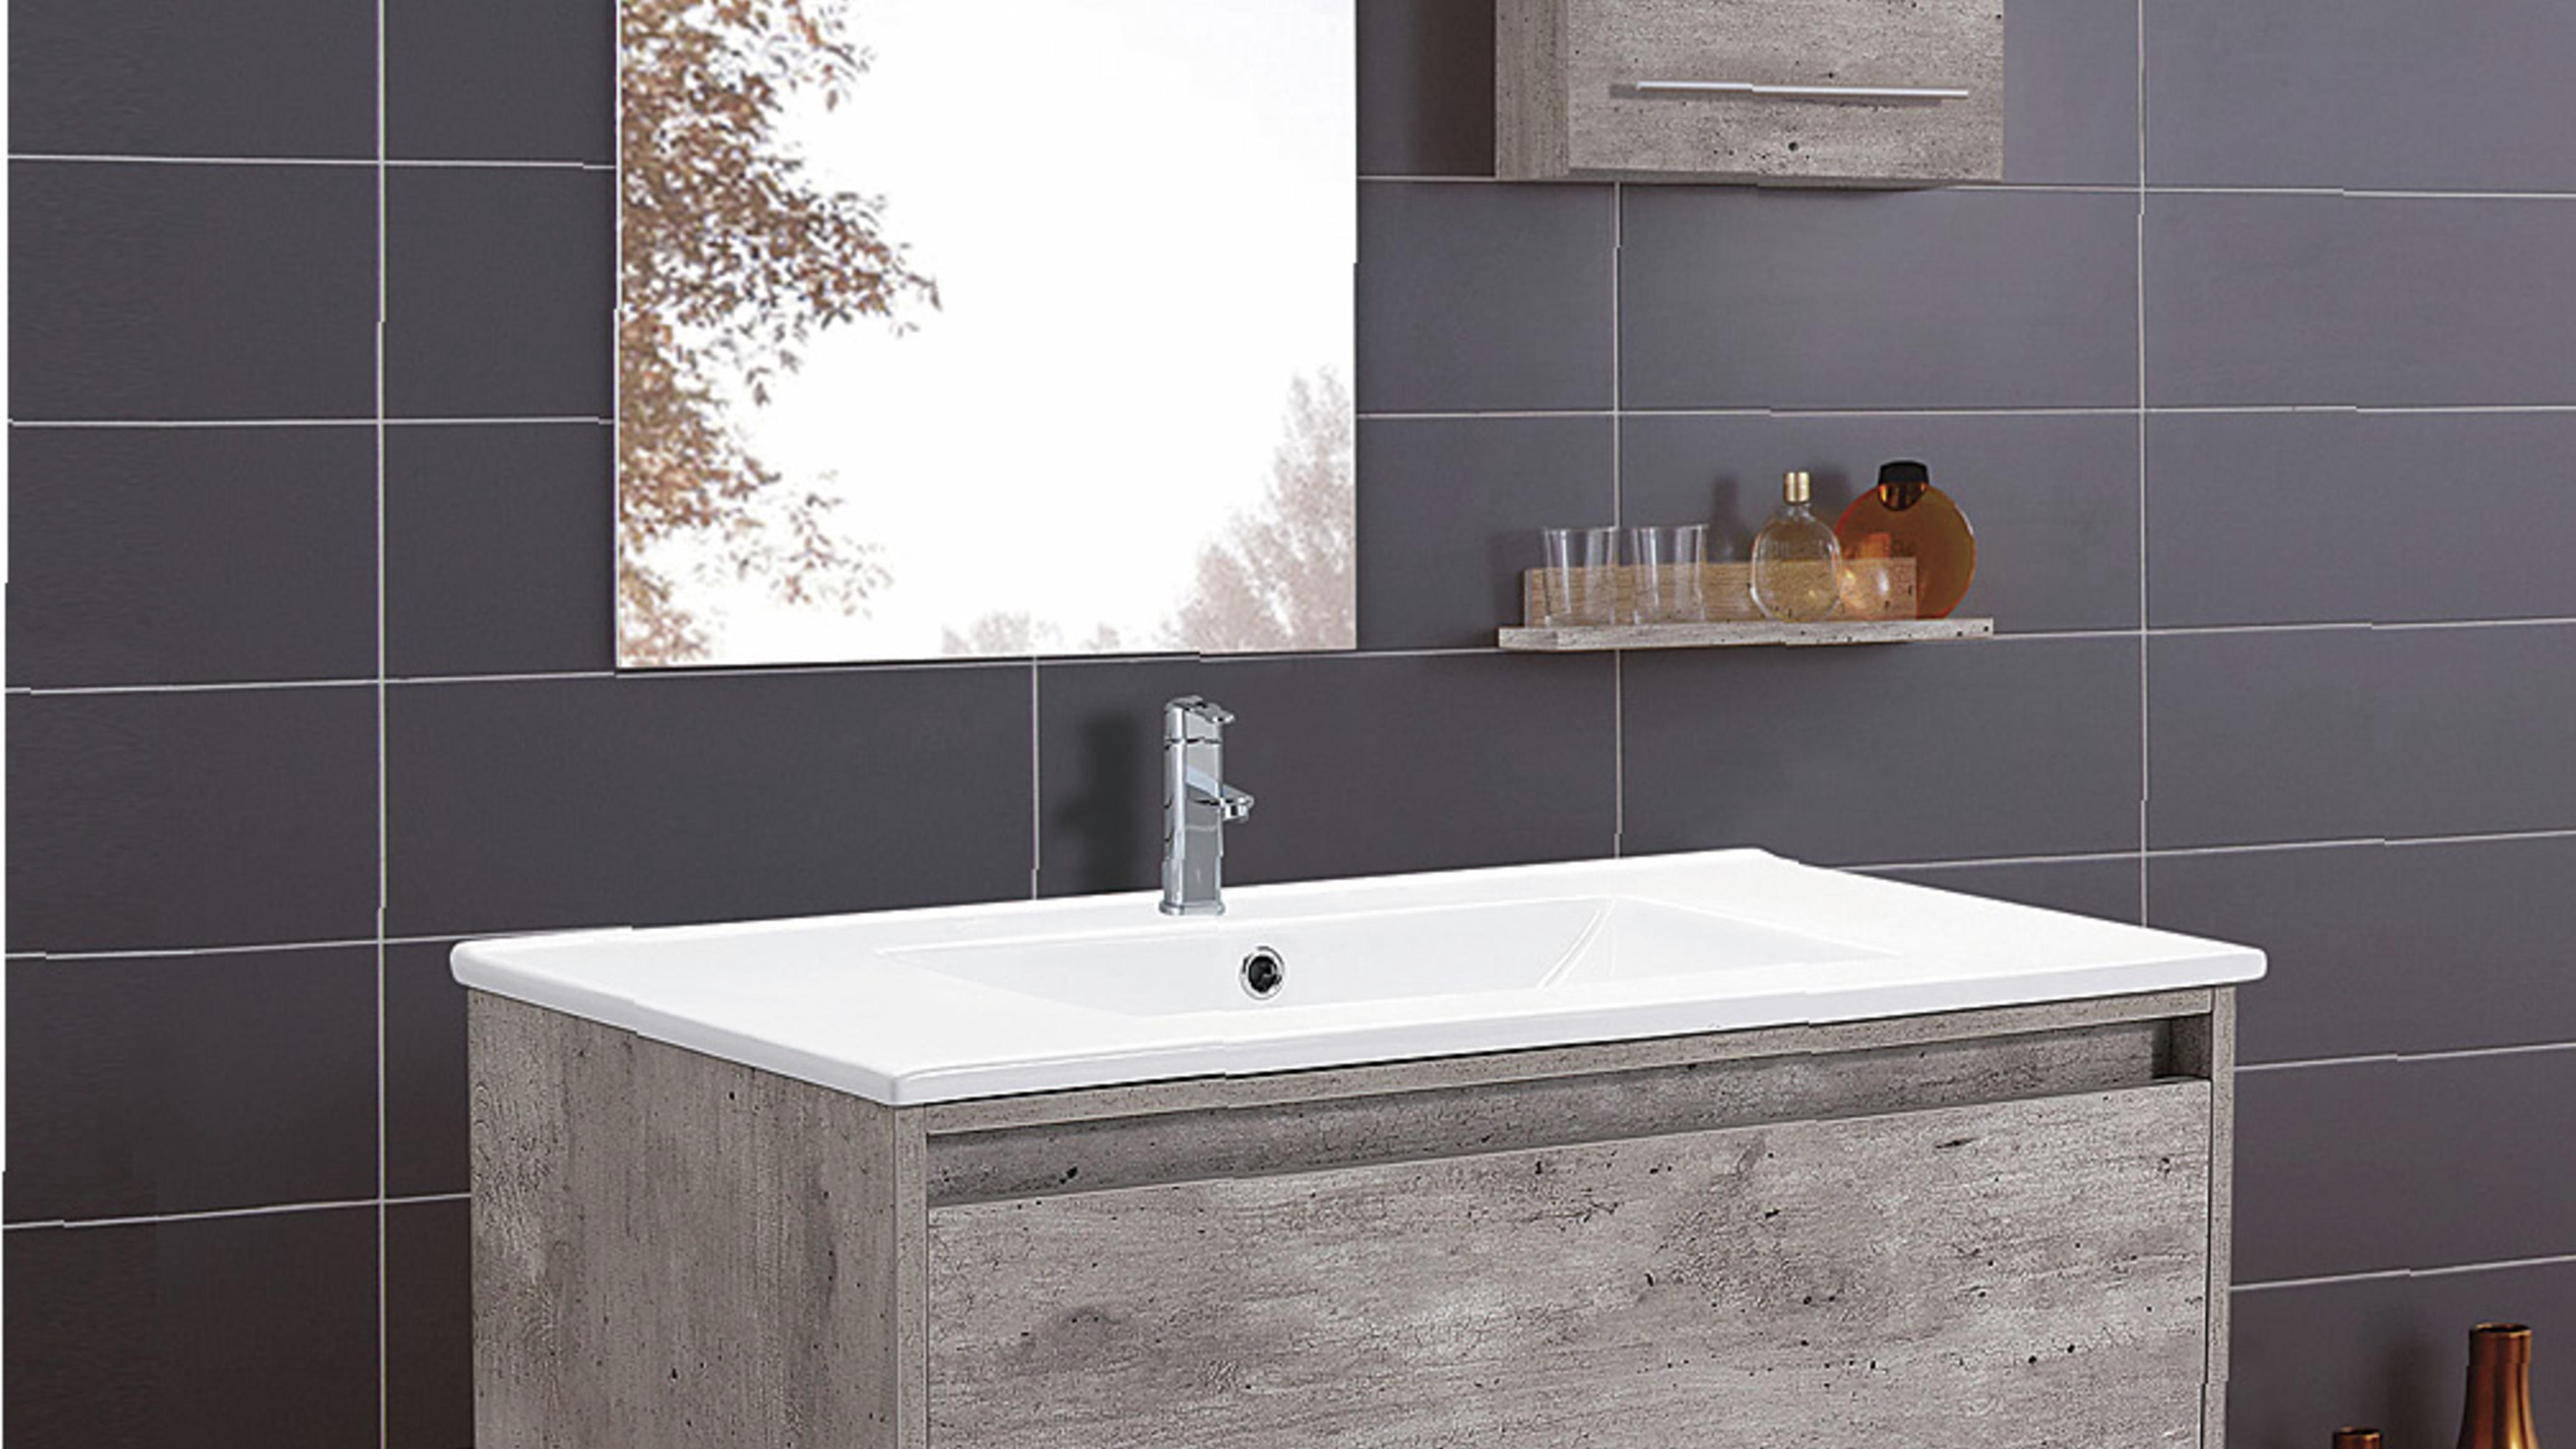 Bathroom featuring undermount sink/basin, grey tiling and mirror.